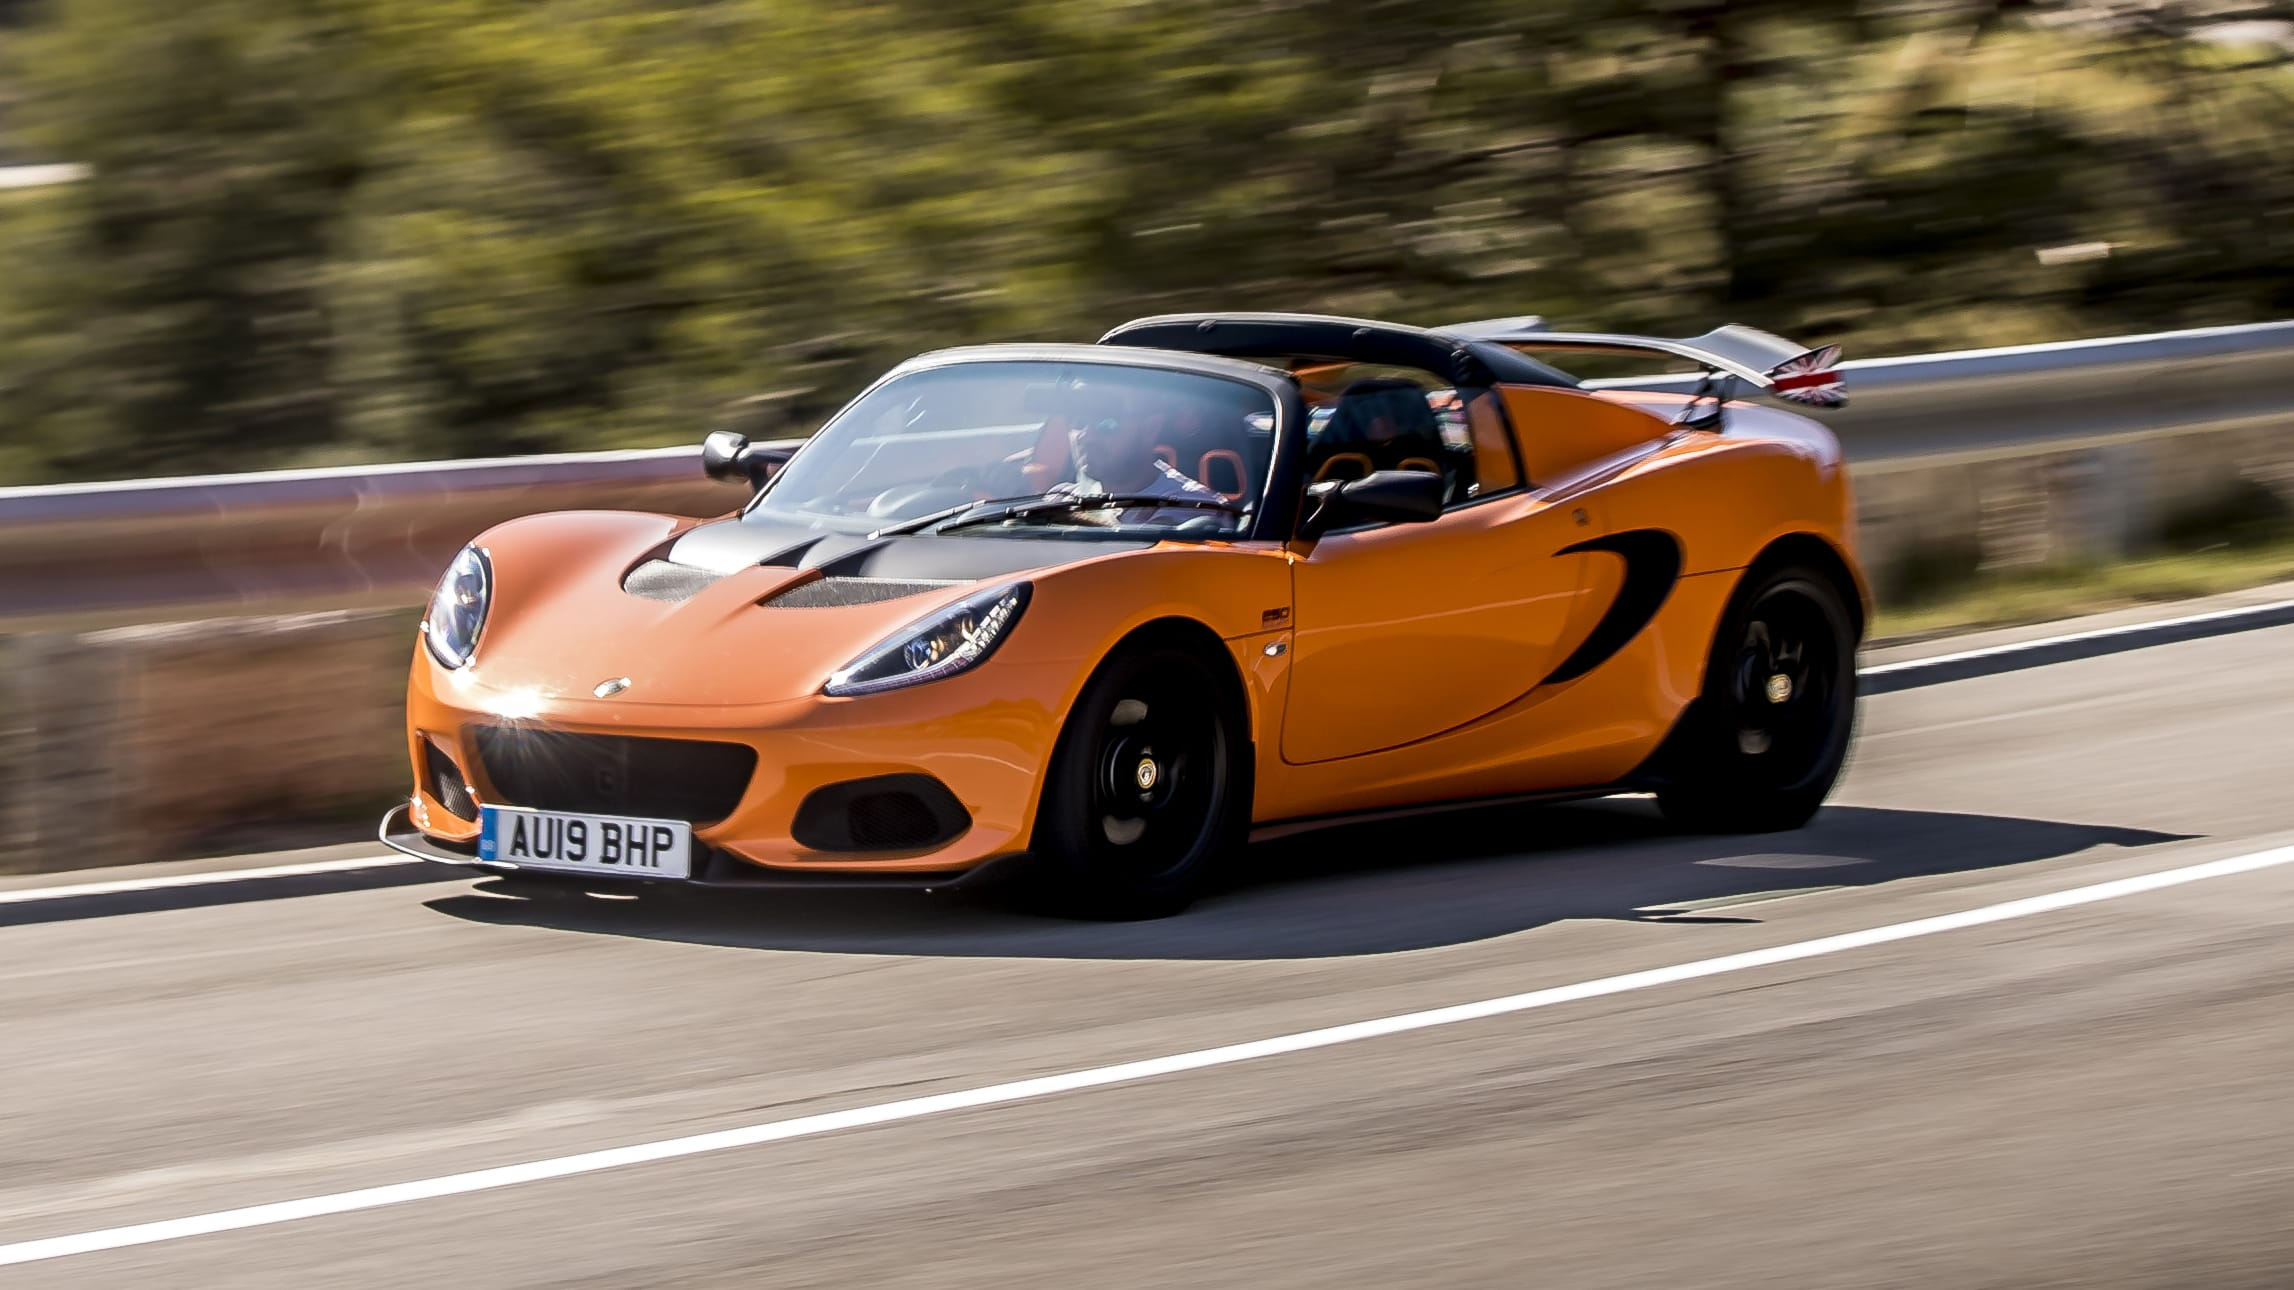 2020 Lotus Exige Performance and New Engine